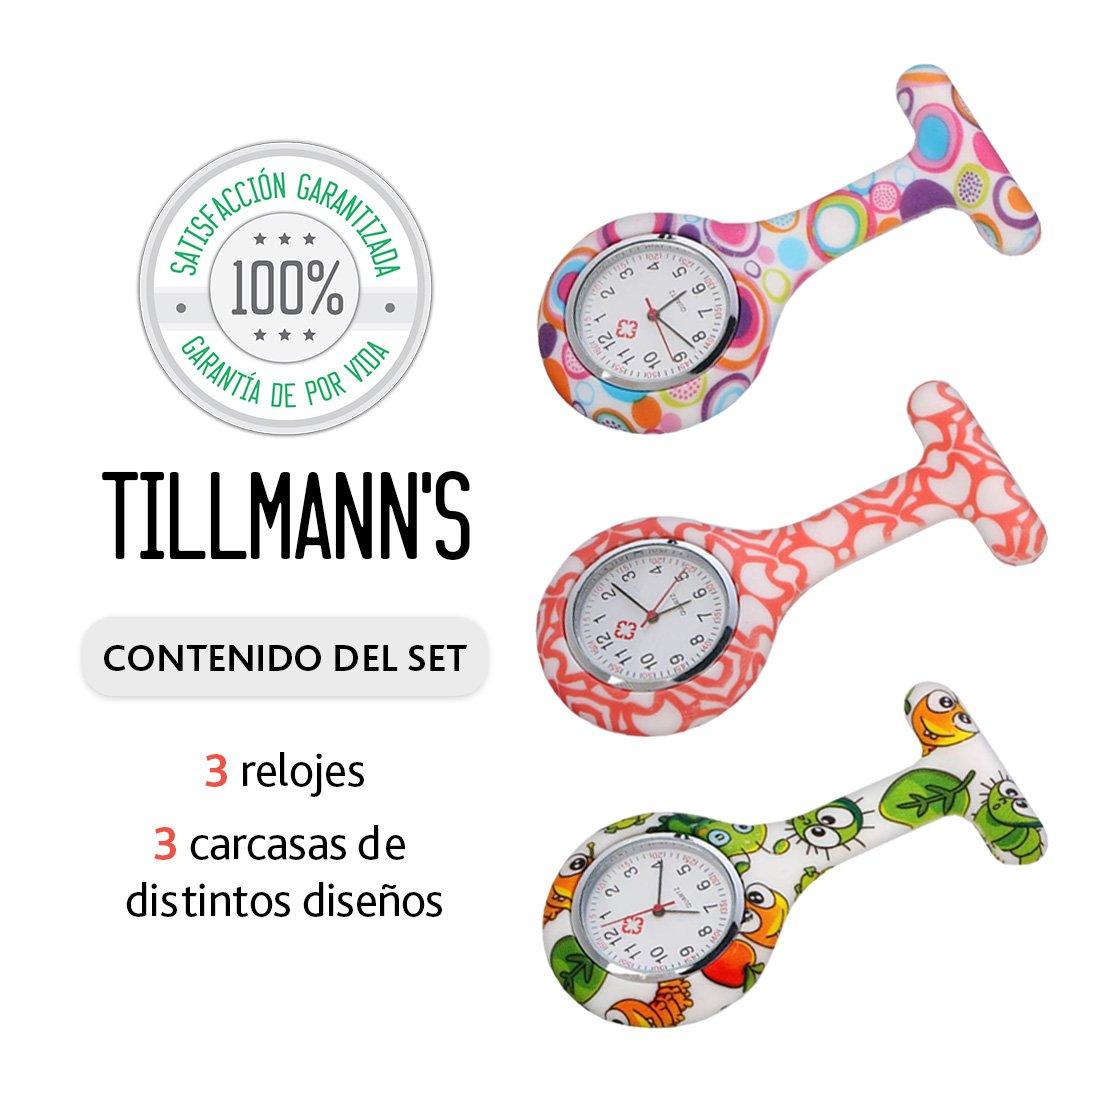 30f2680505b0 Tillmann s® Reloj Enfermera 3 unidades - Relojes De Enfermera - Reloj  Bolsillo Enfermera - Relojes De Enfermeria  Amazon.es  Relojes